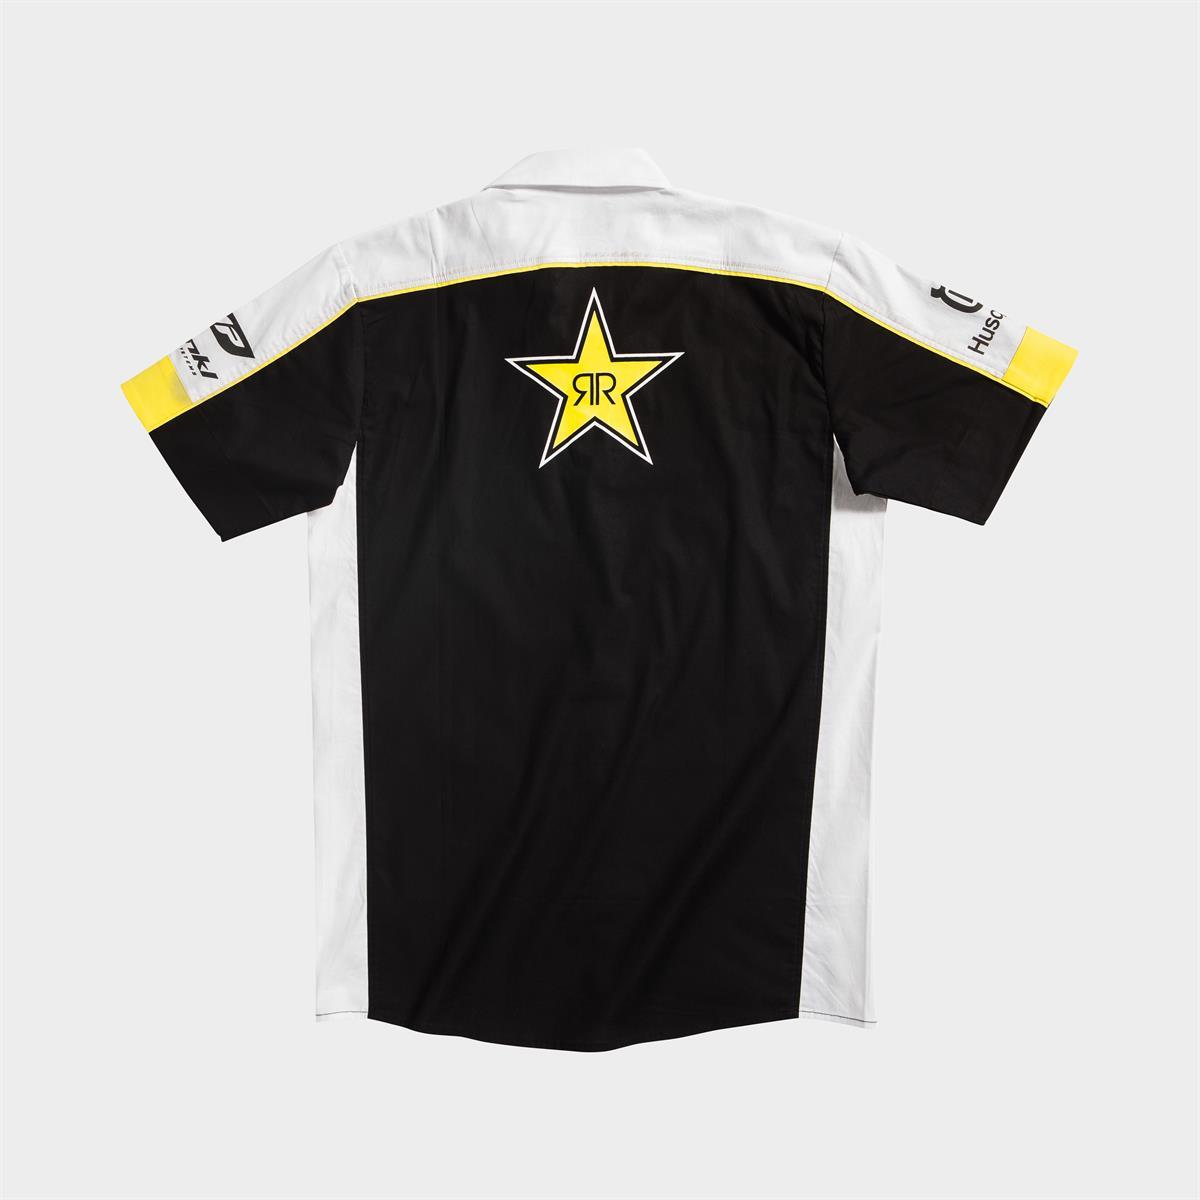 Rockstar Energy Husqvarna Factory Racing Replica Collection Team Shirt